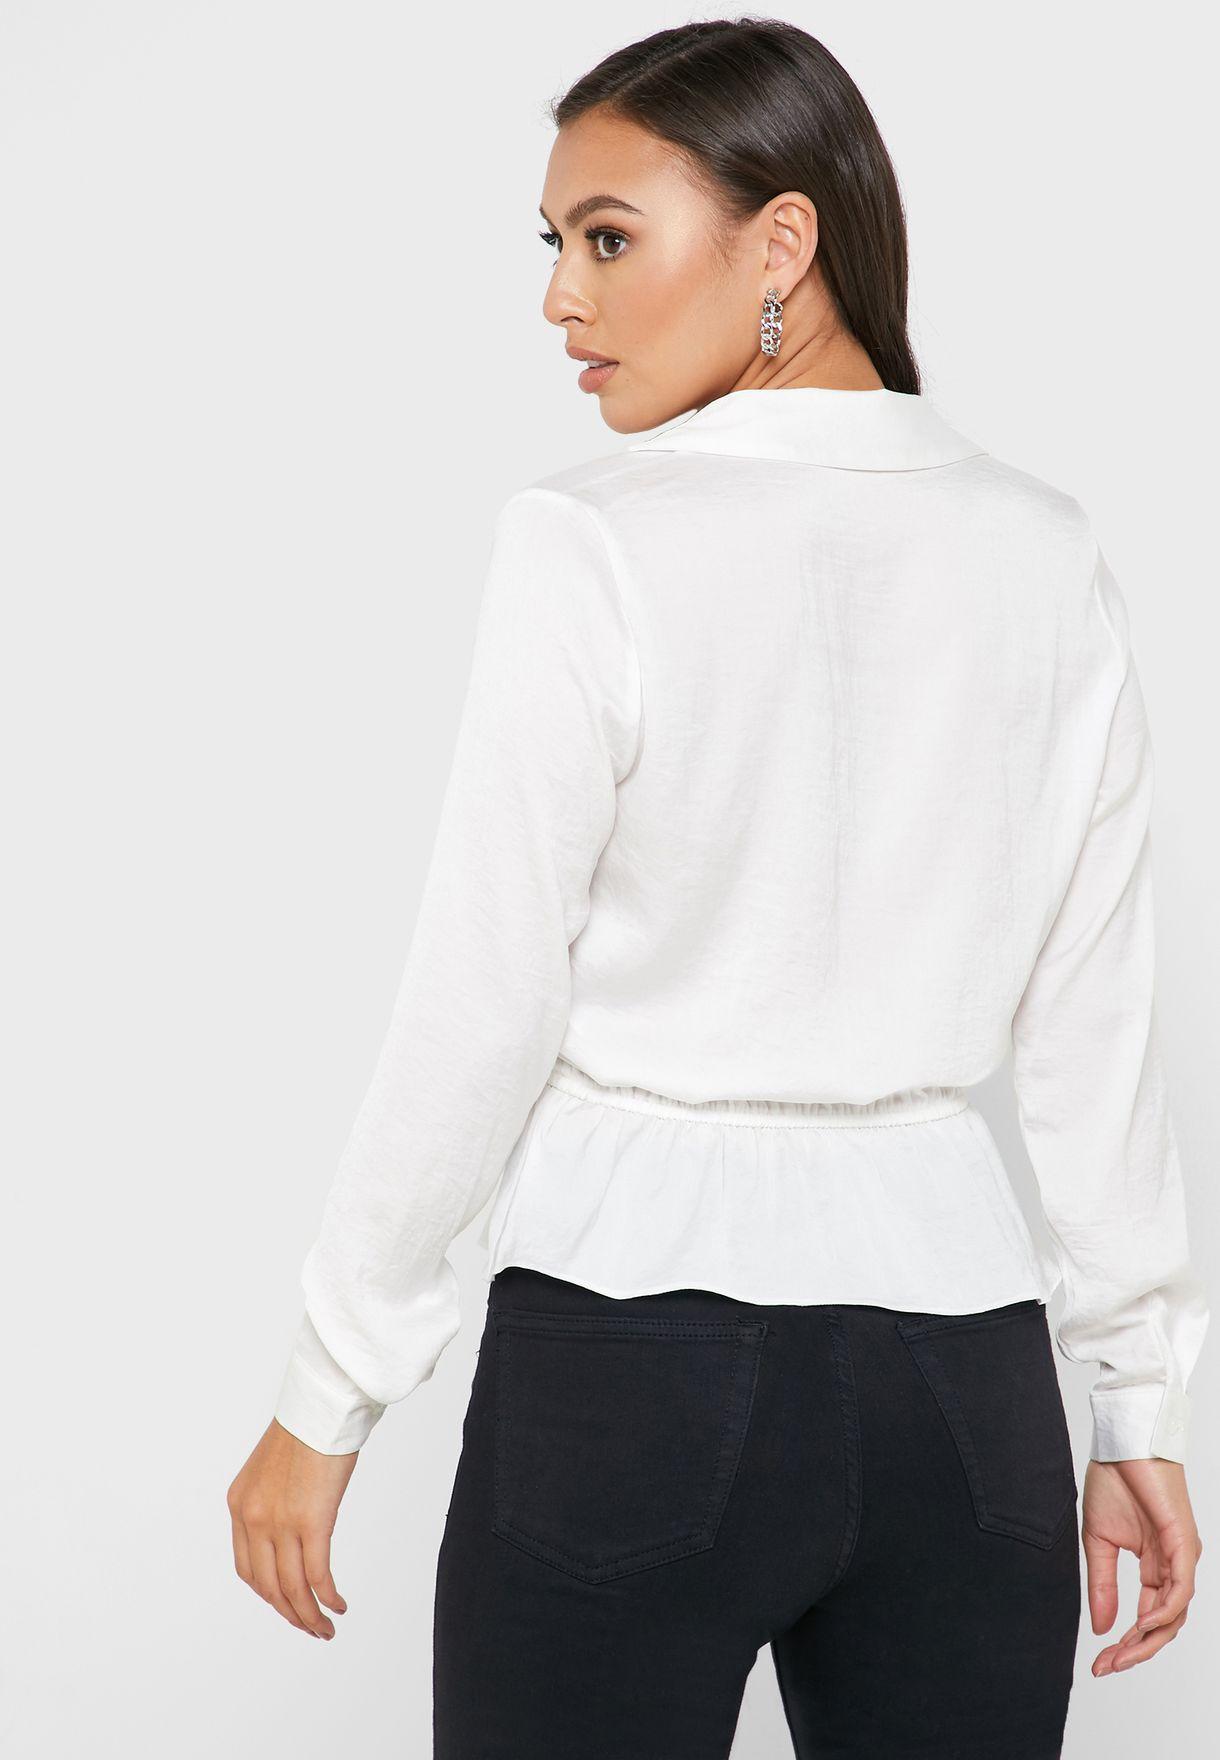 Front Button Tie Waist Shirt